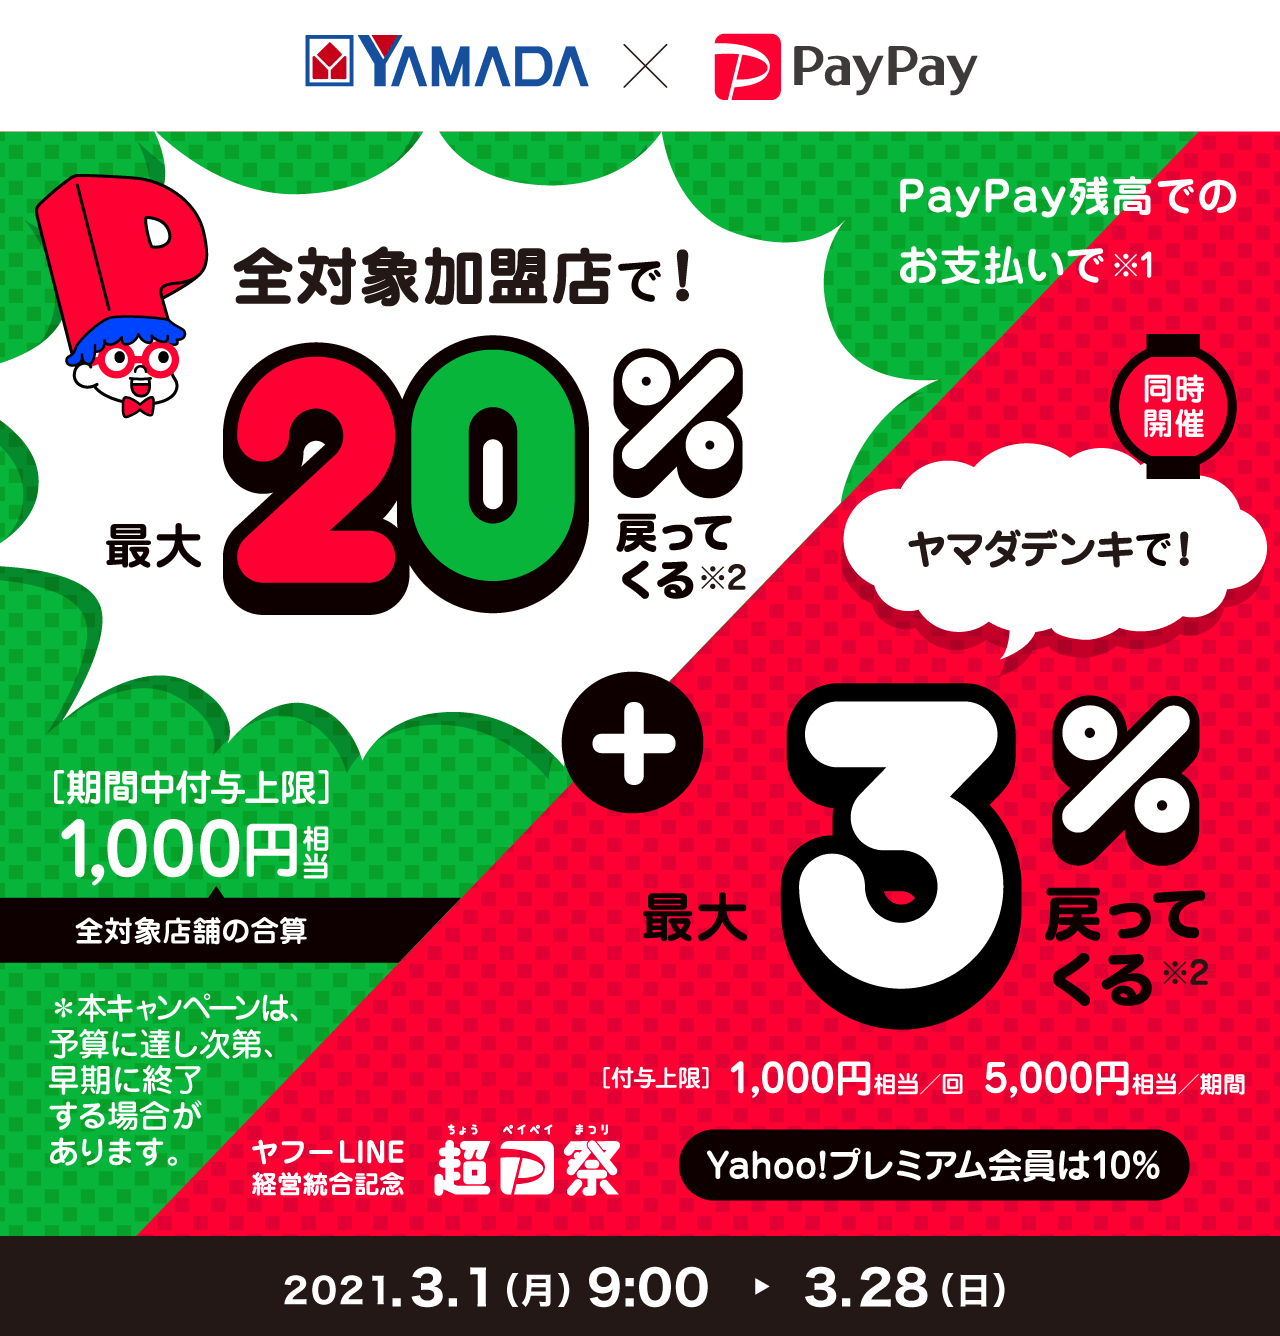 payapyヤマダ電機還元キャンペーン